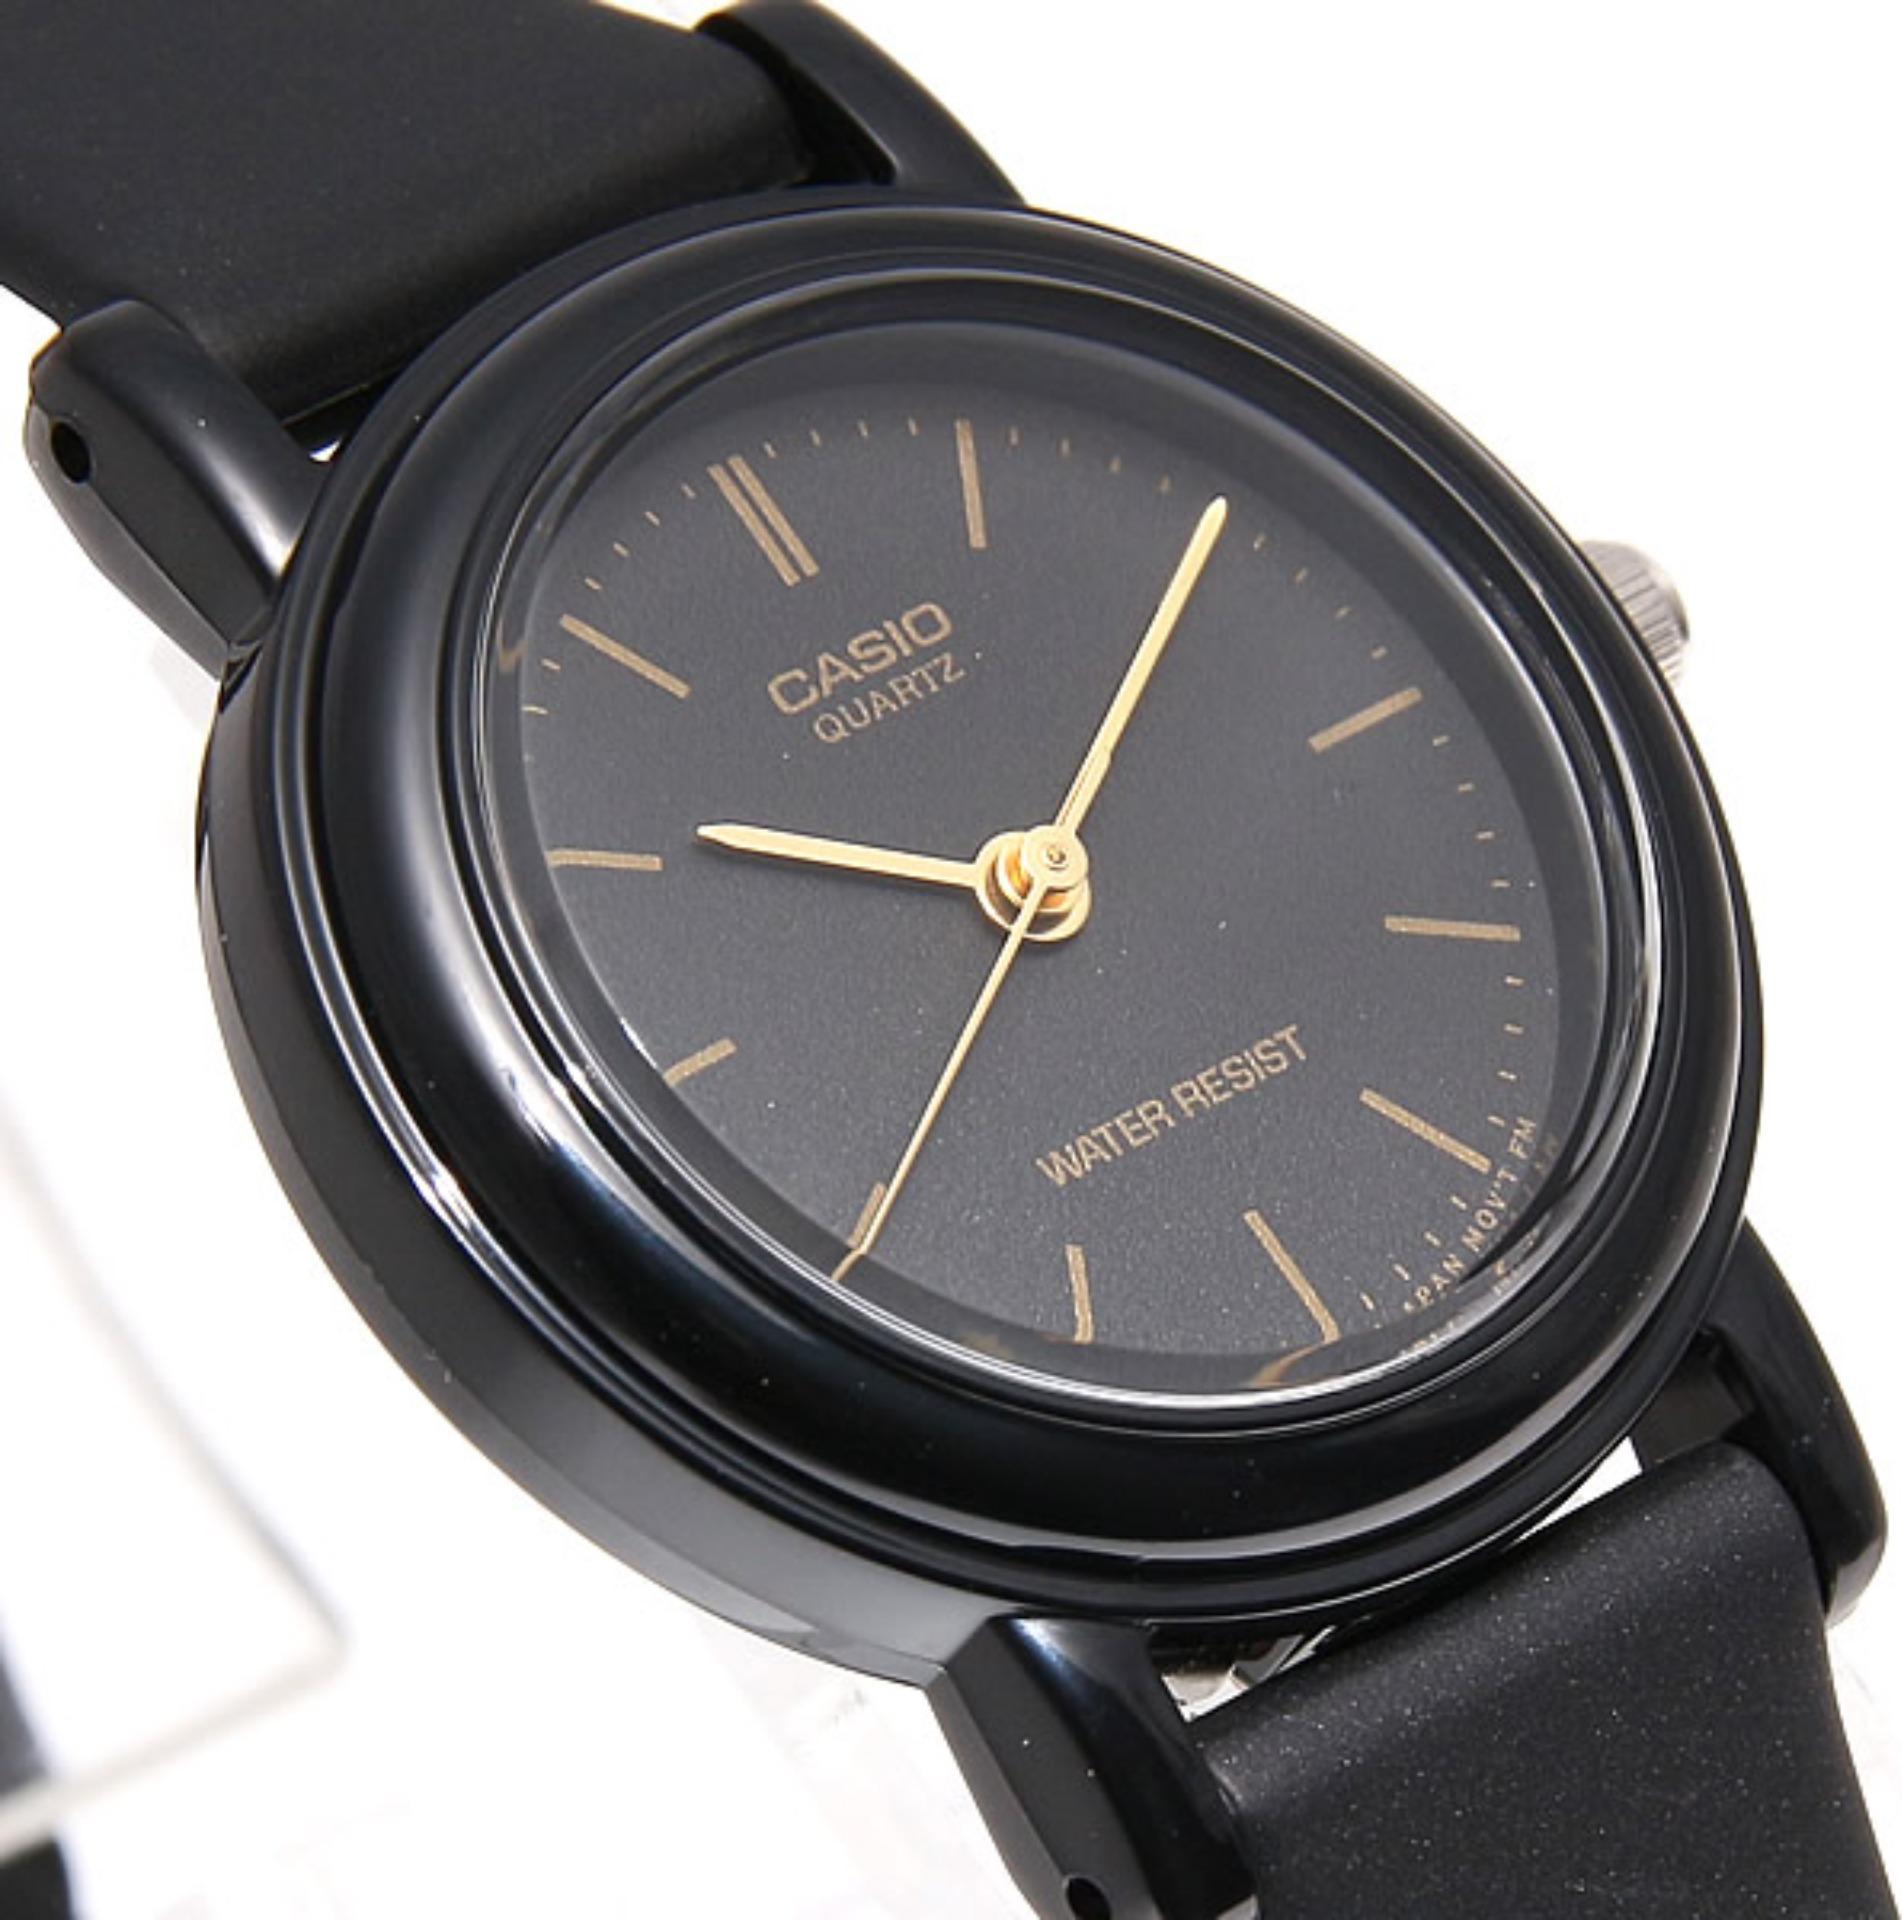 Đồng hồ nữ dây nhựa Casio LQ-139AMV-1ELDF